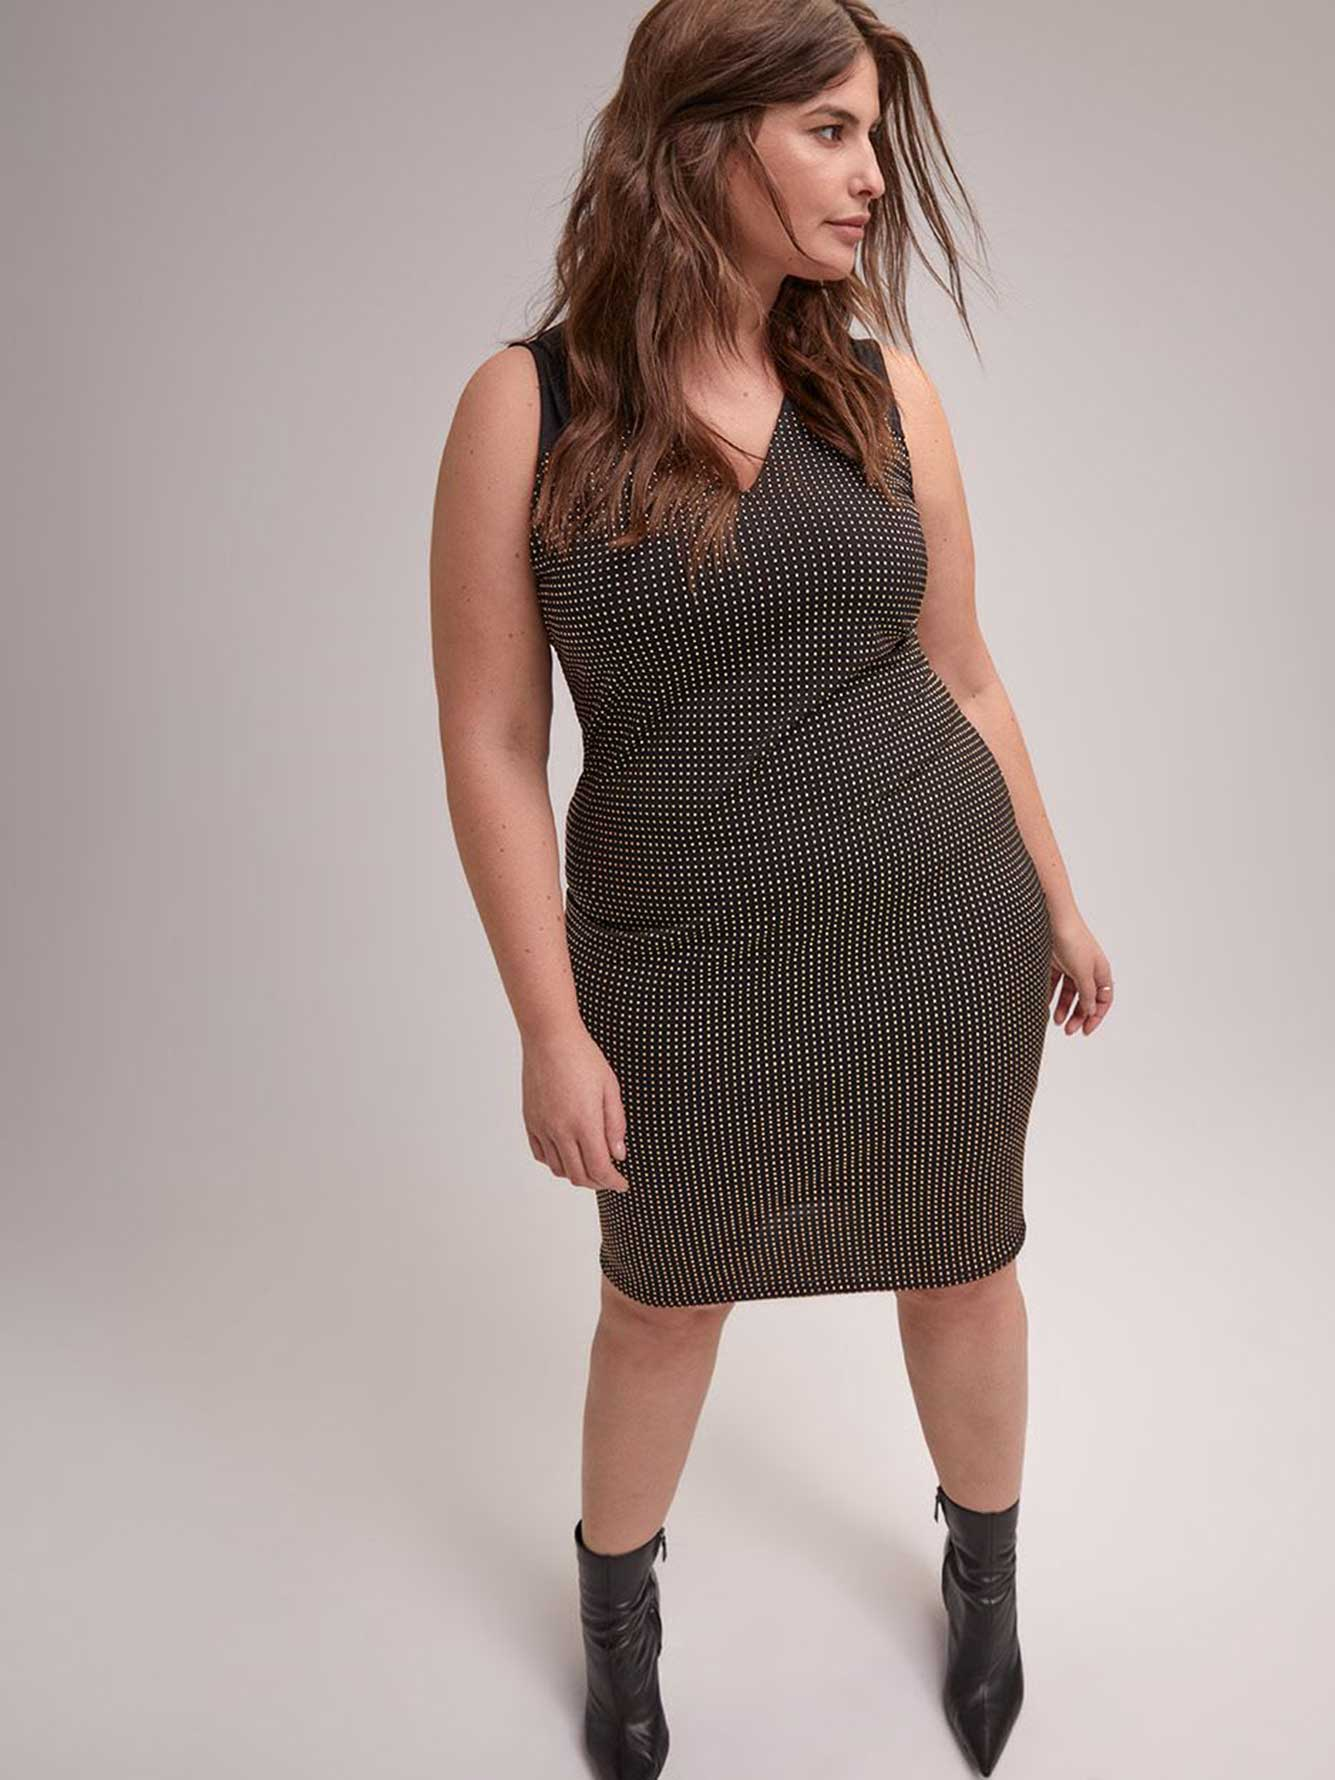 Callie Dress - RACHEL Rachel Roy  84f4eb1c0